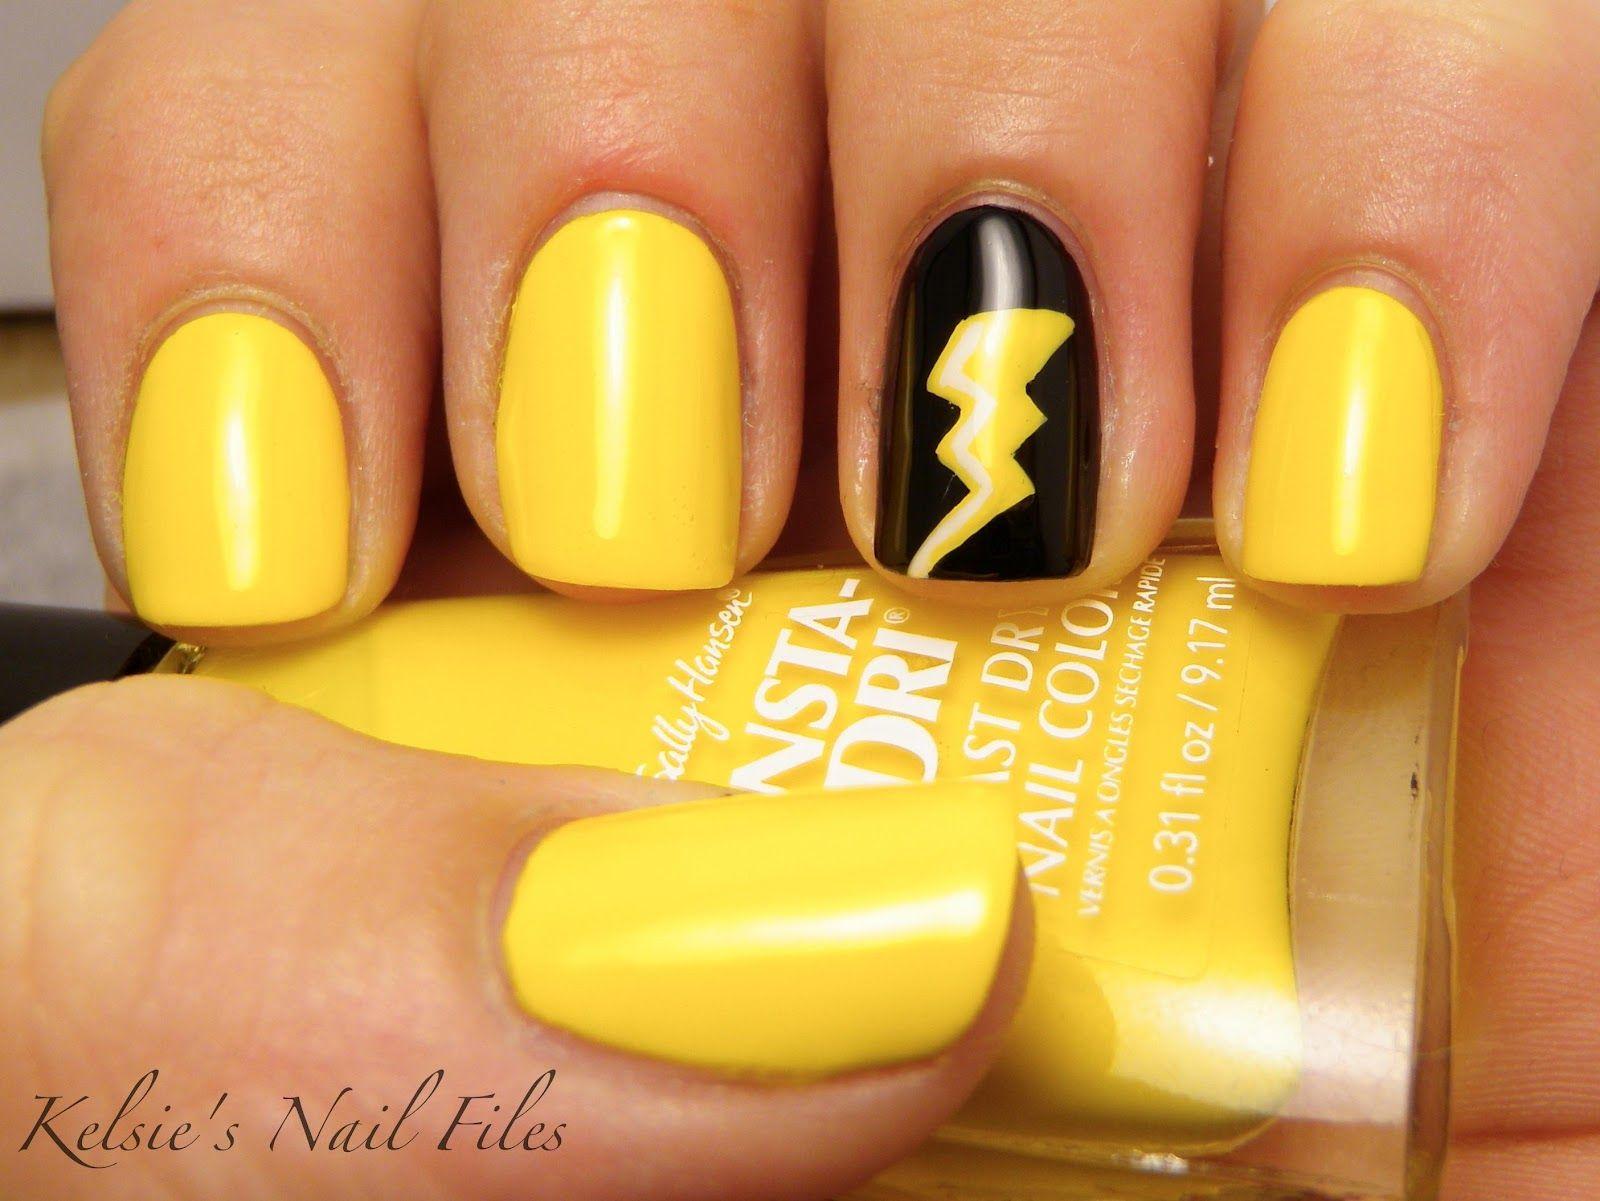 Yellow Nail Polish Designs | ... Paints Paper Mache. The bolt was ...